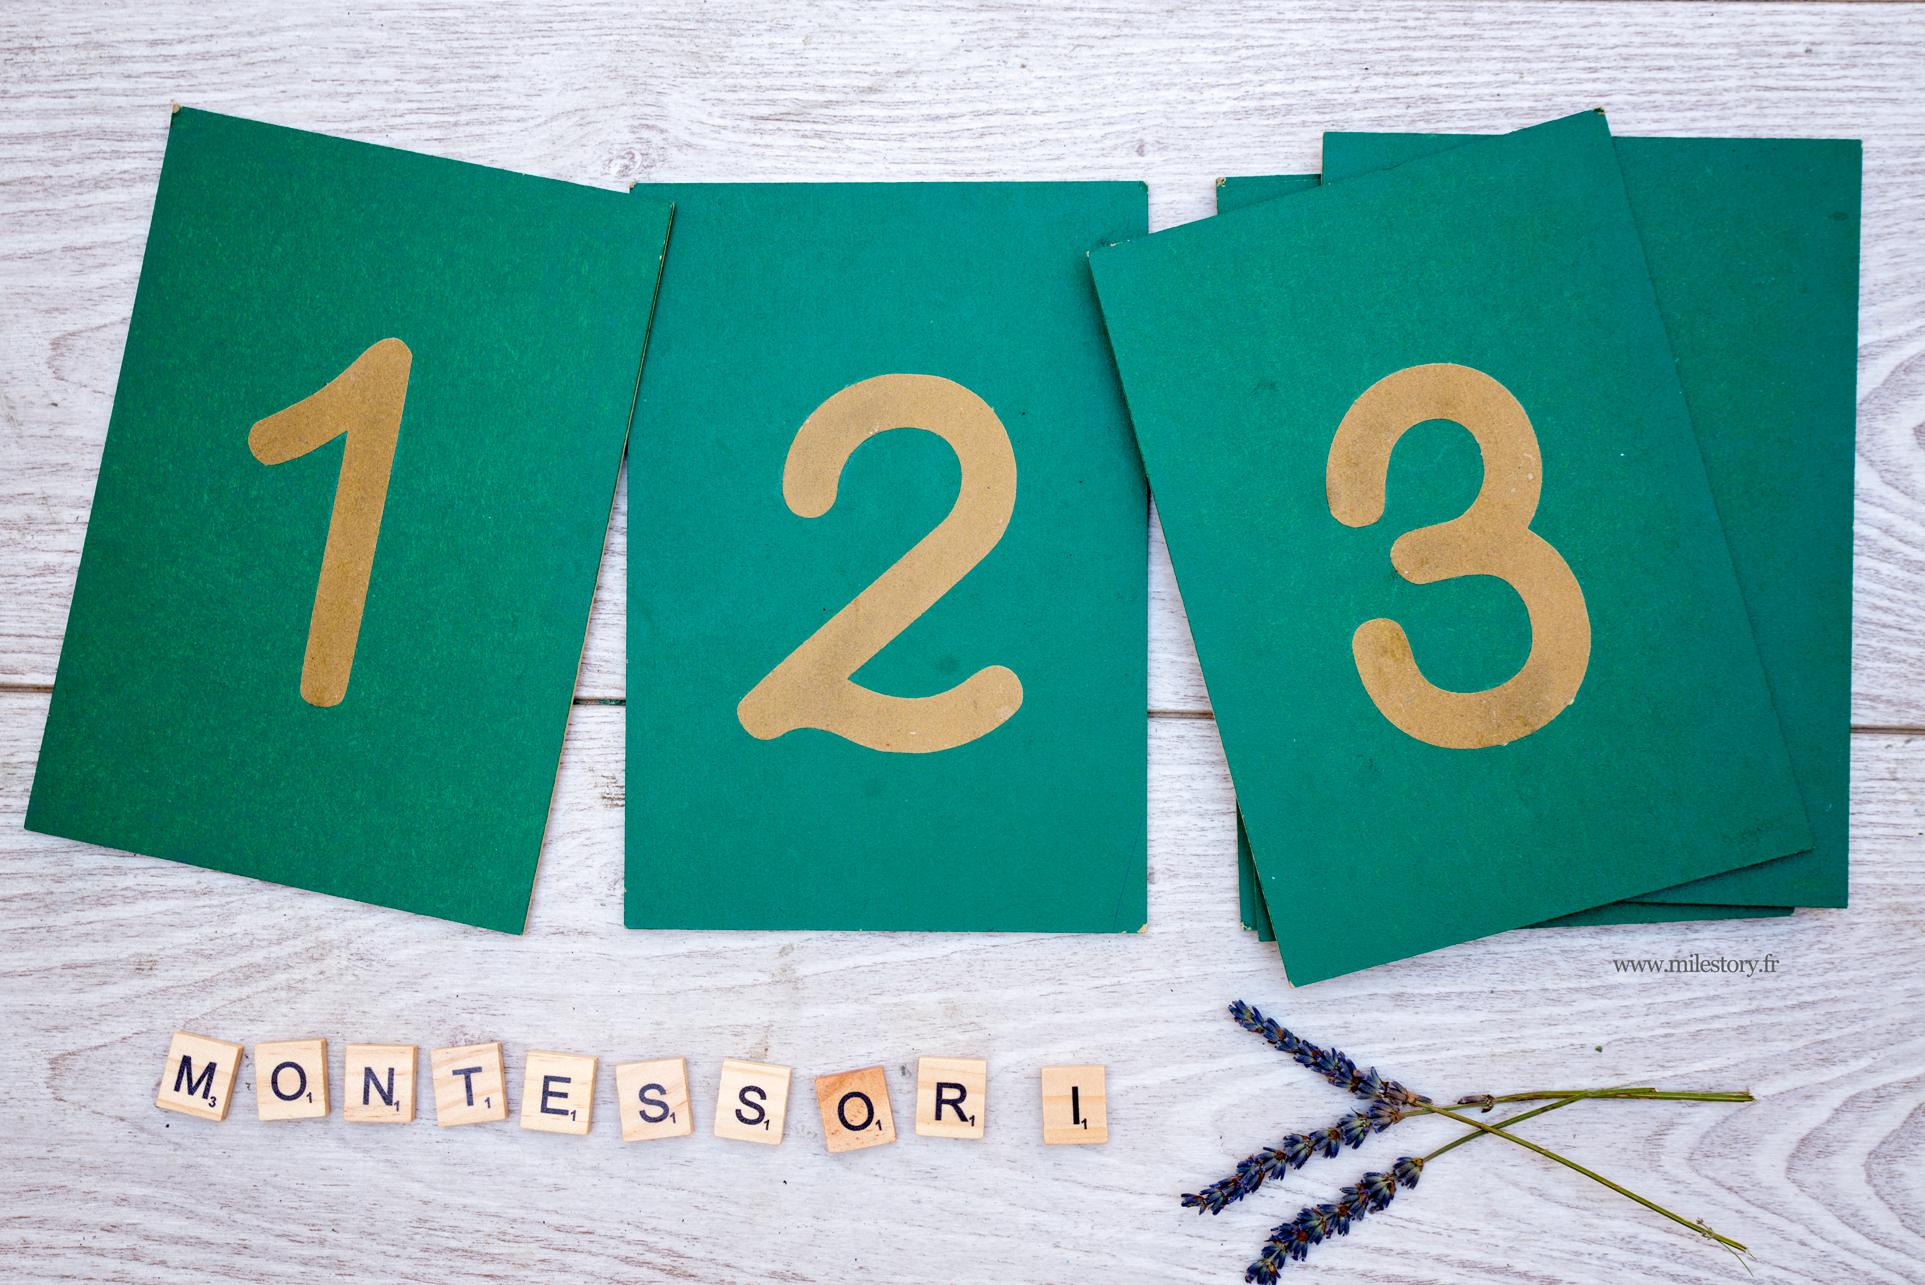 chiffres rugueux montessori